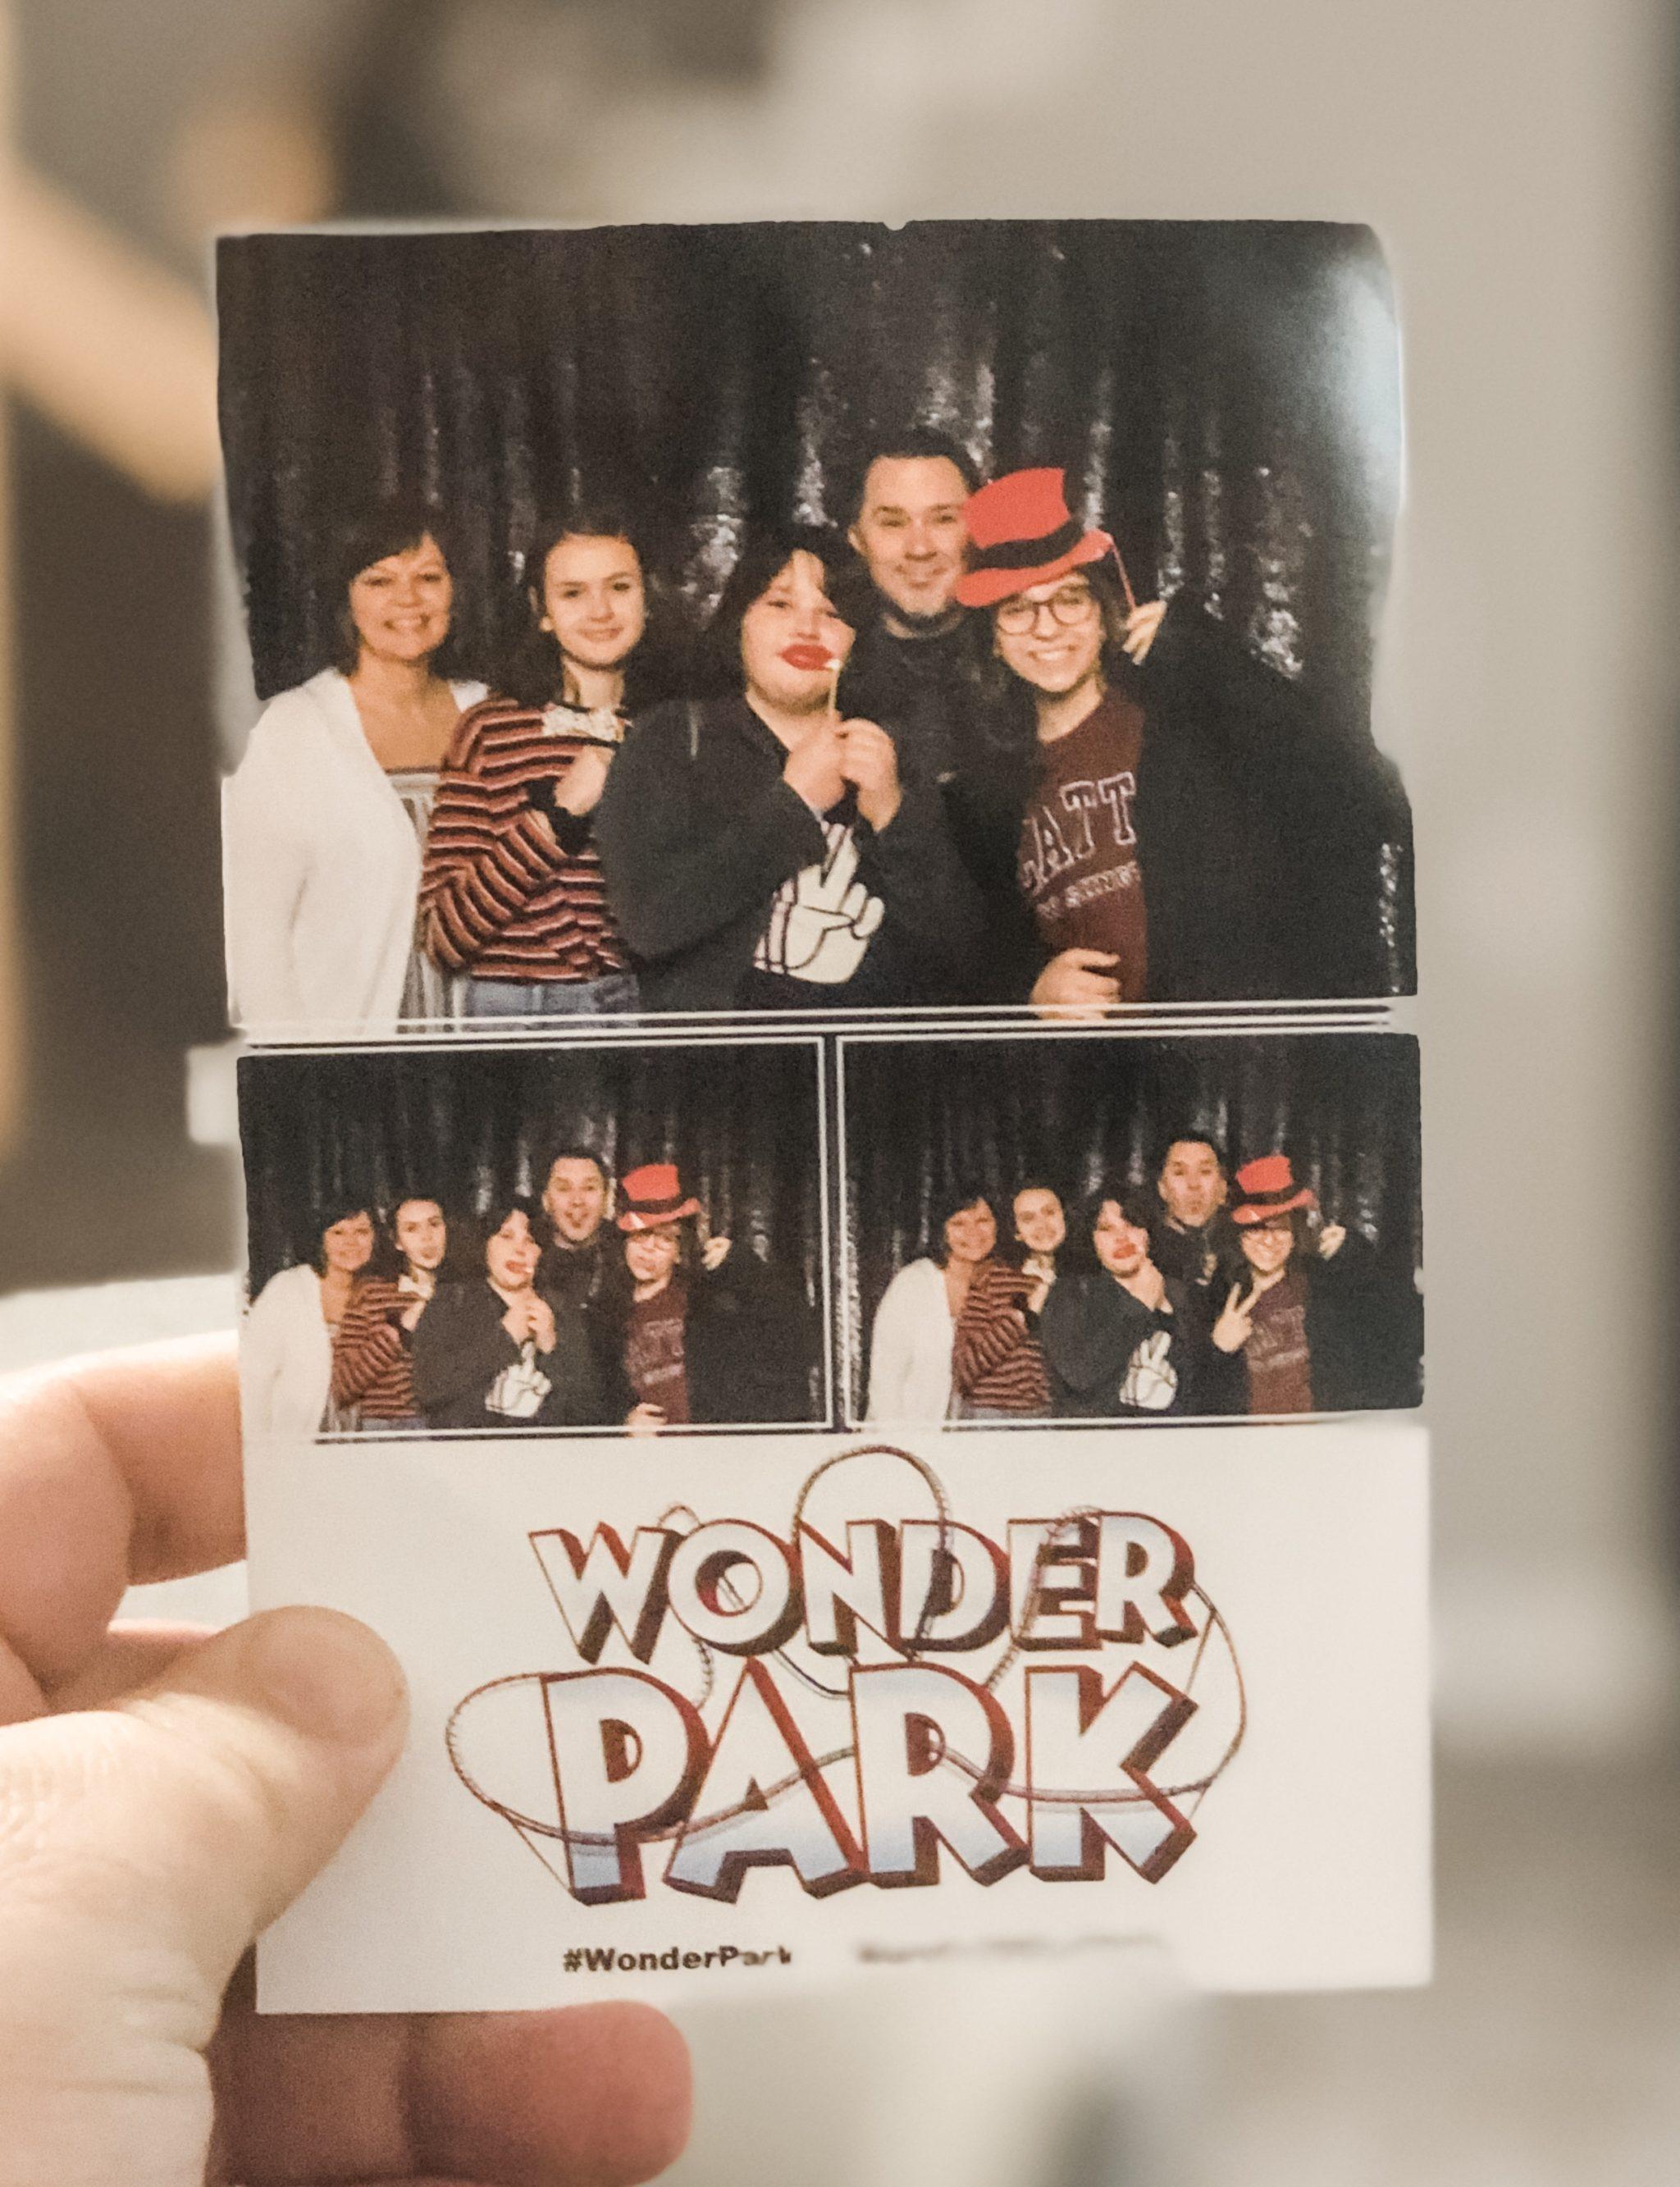 Wonder Park is Splendiferous